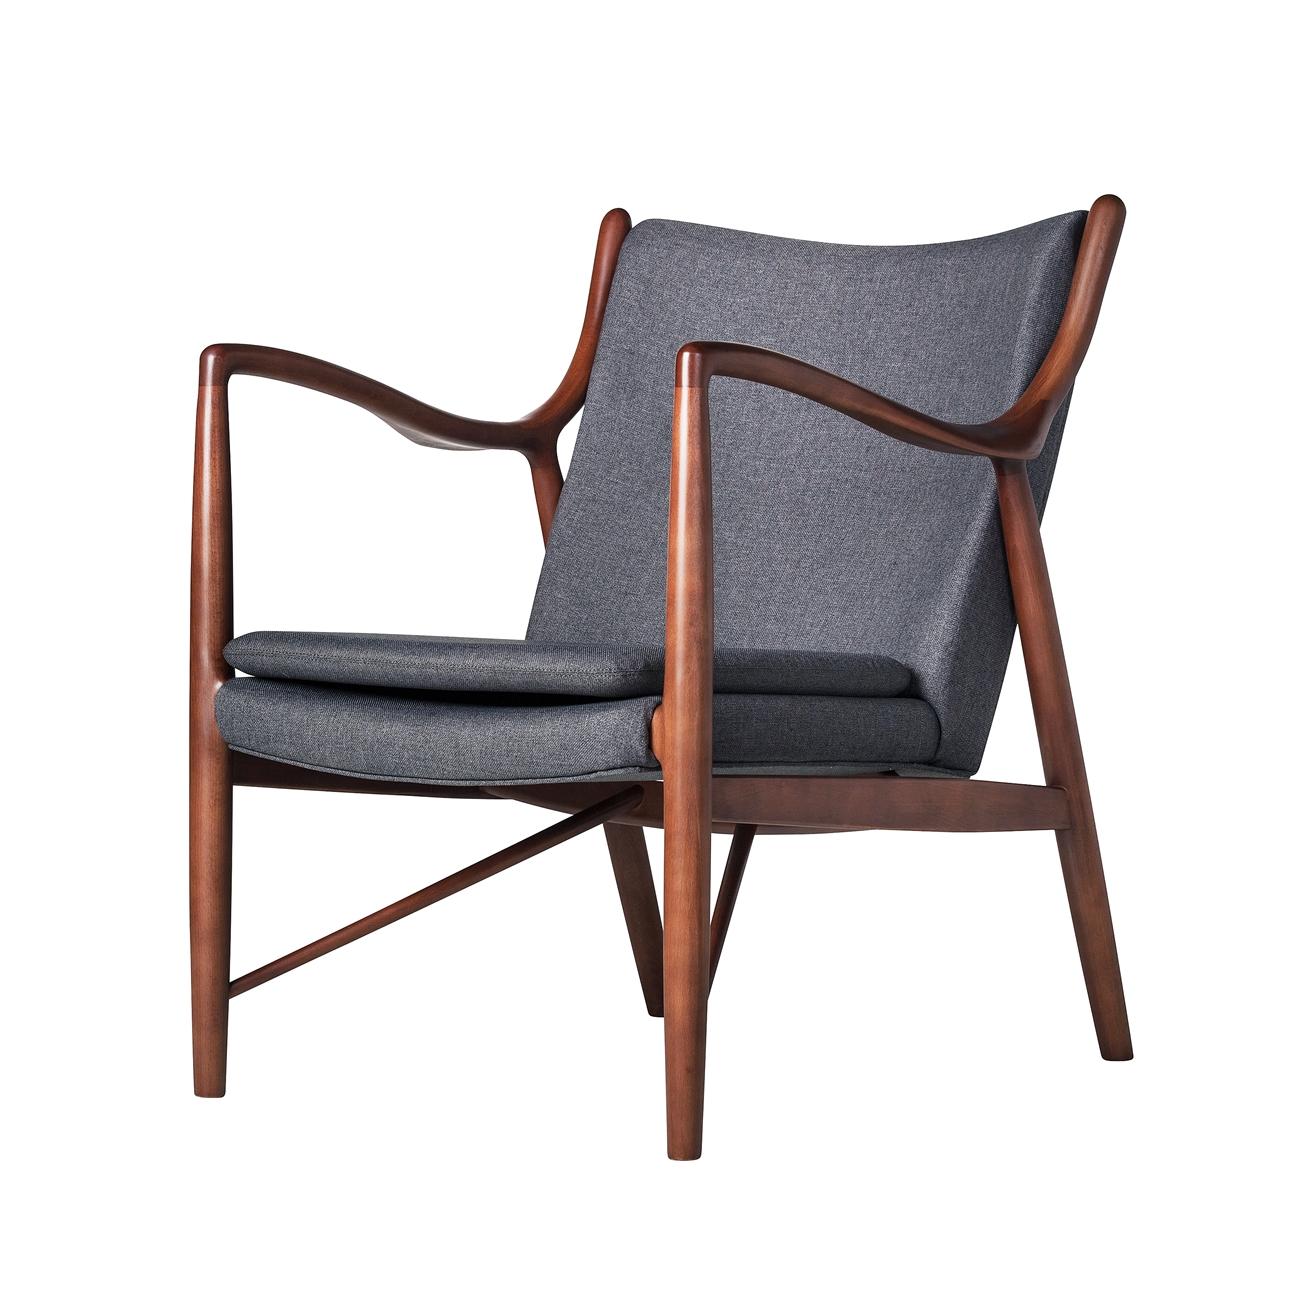 Astounding Finn Juhl Inspired 45 Chair Walnut Frame In Dark Grey Pabps2019 Chair Design Images Pabps2019Com